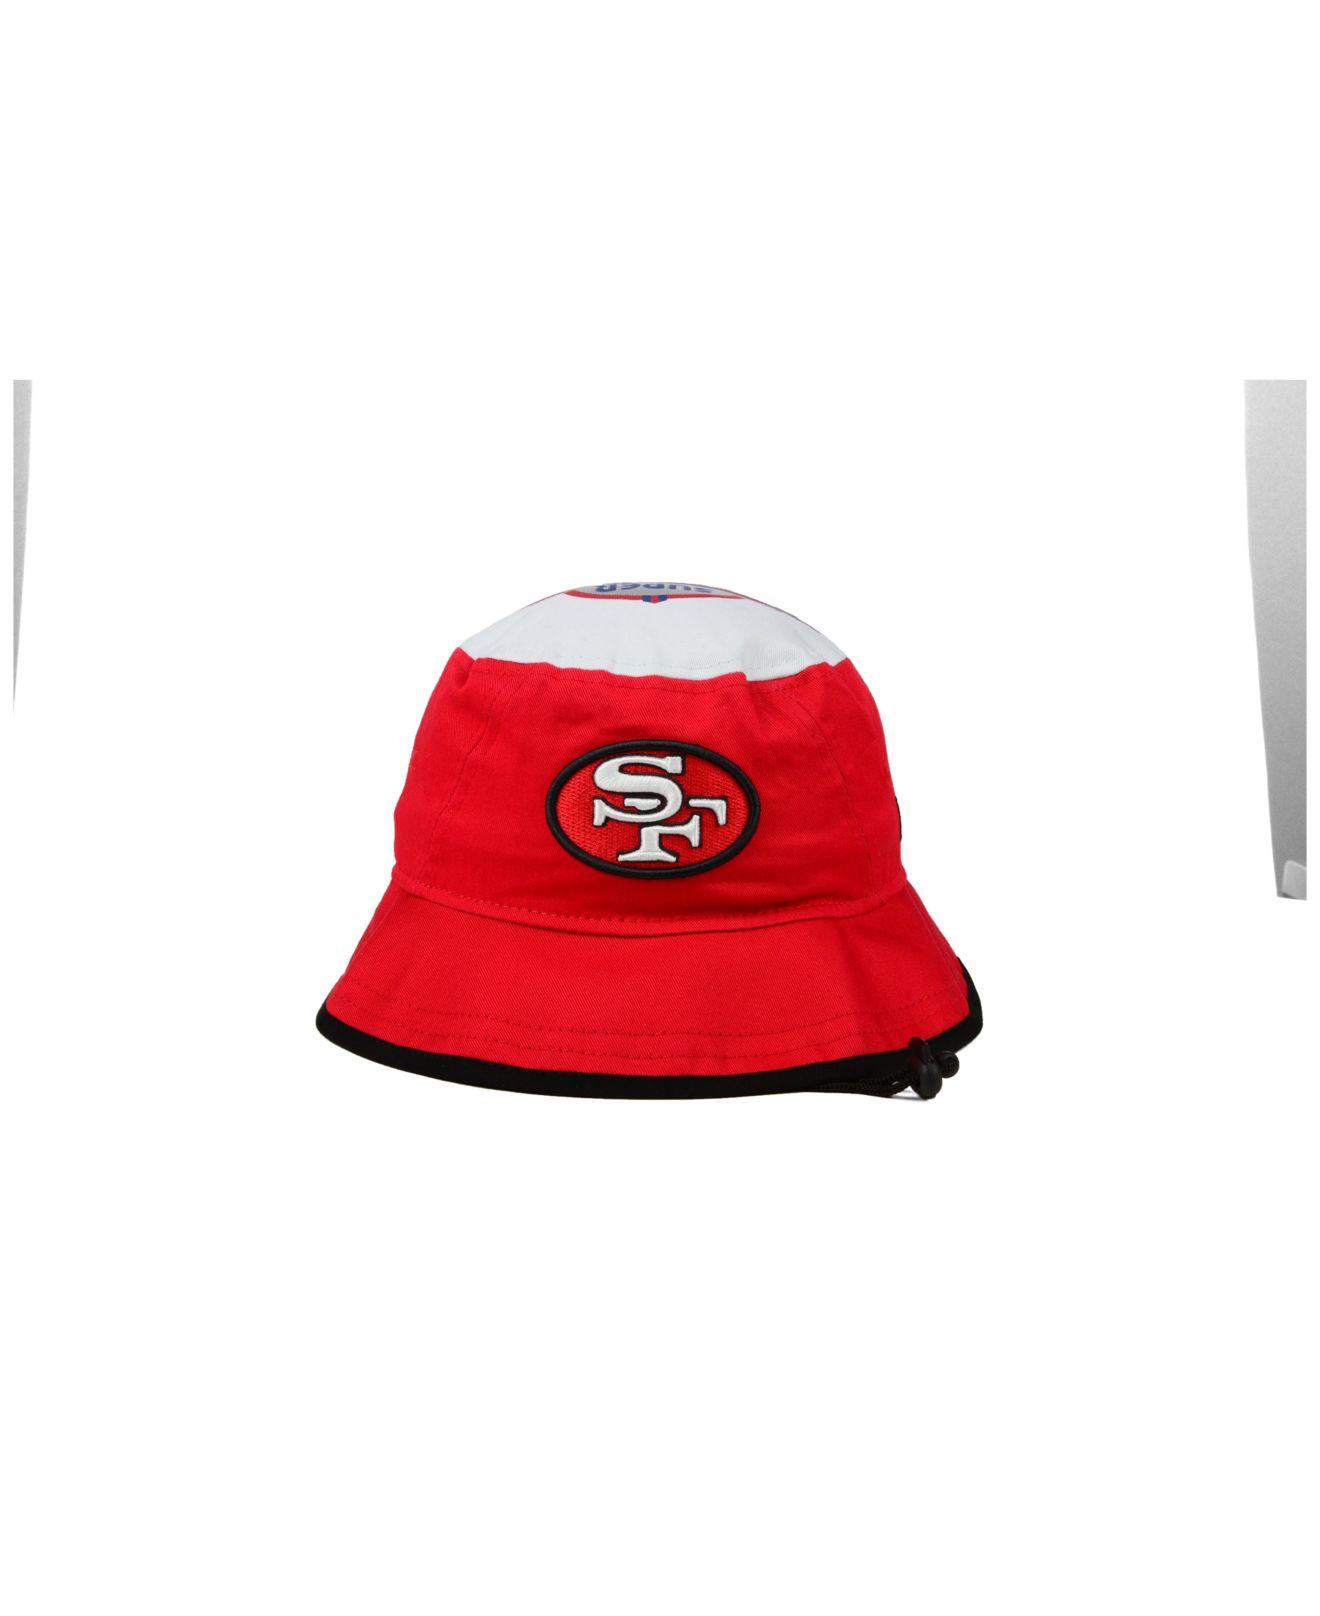 373fe6f3f95 Lyst - Ktz San Francisco 49ers Traveler Bucket Hat in Red for Men